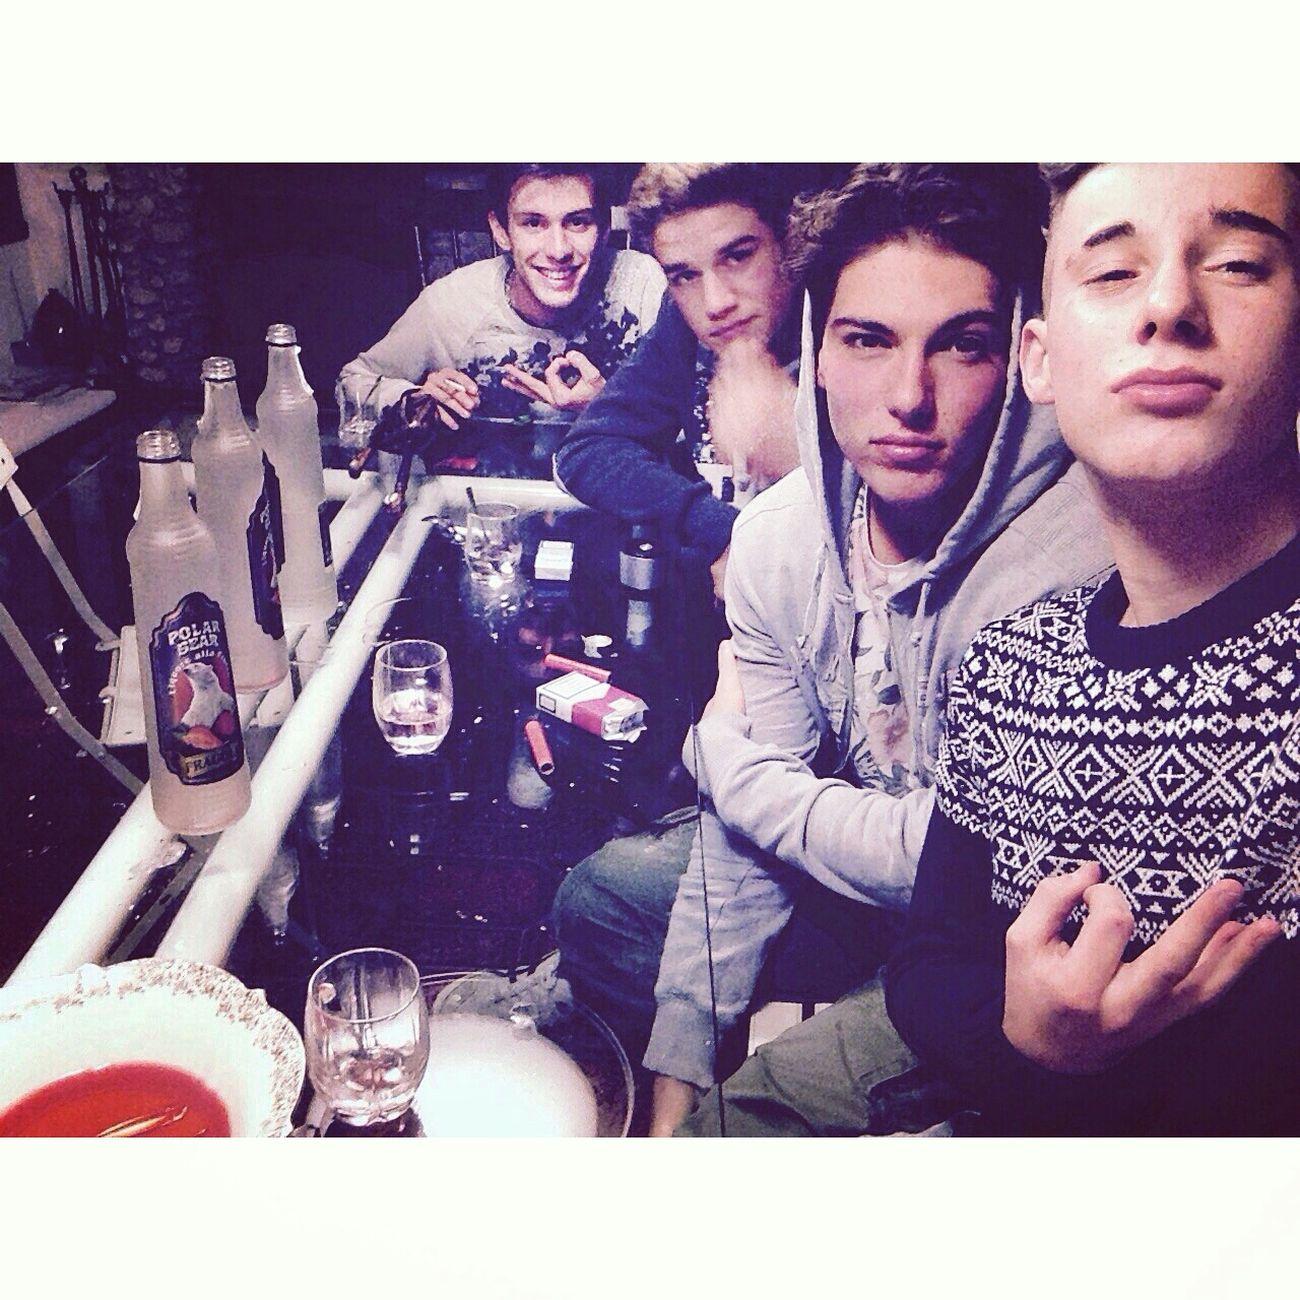 Memories Friends Love Vodka Party Enjoy Followme Swag Style Follow4follow